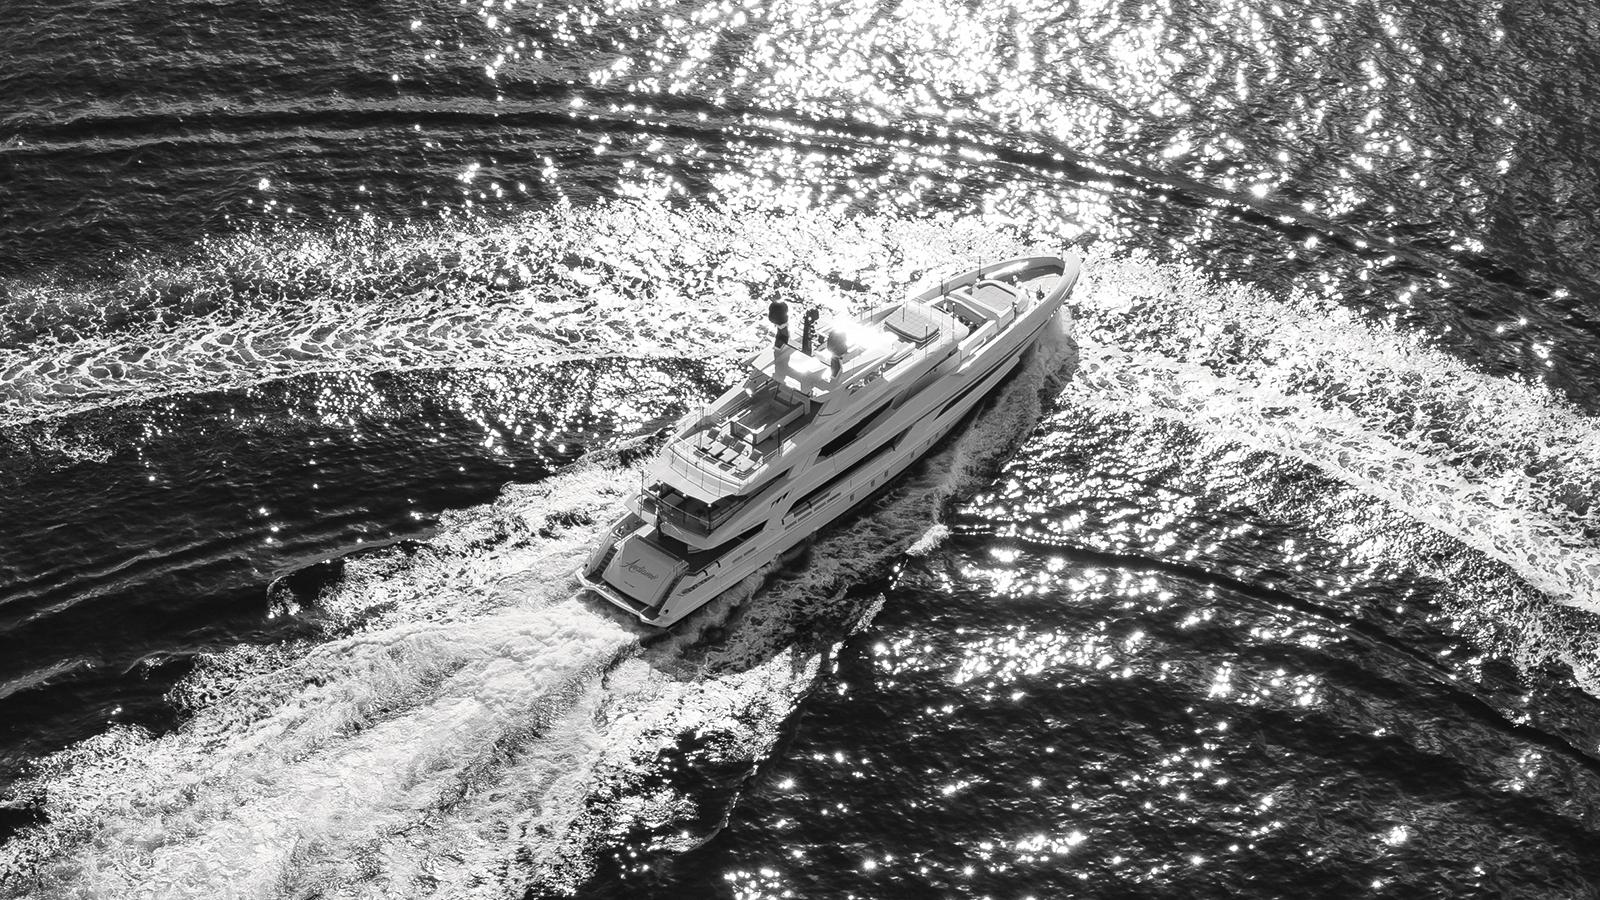 aerial-running-shot-of-the-baglietto-motor-yacht-andiamo-credit-emilio-bianchi